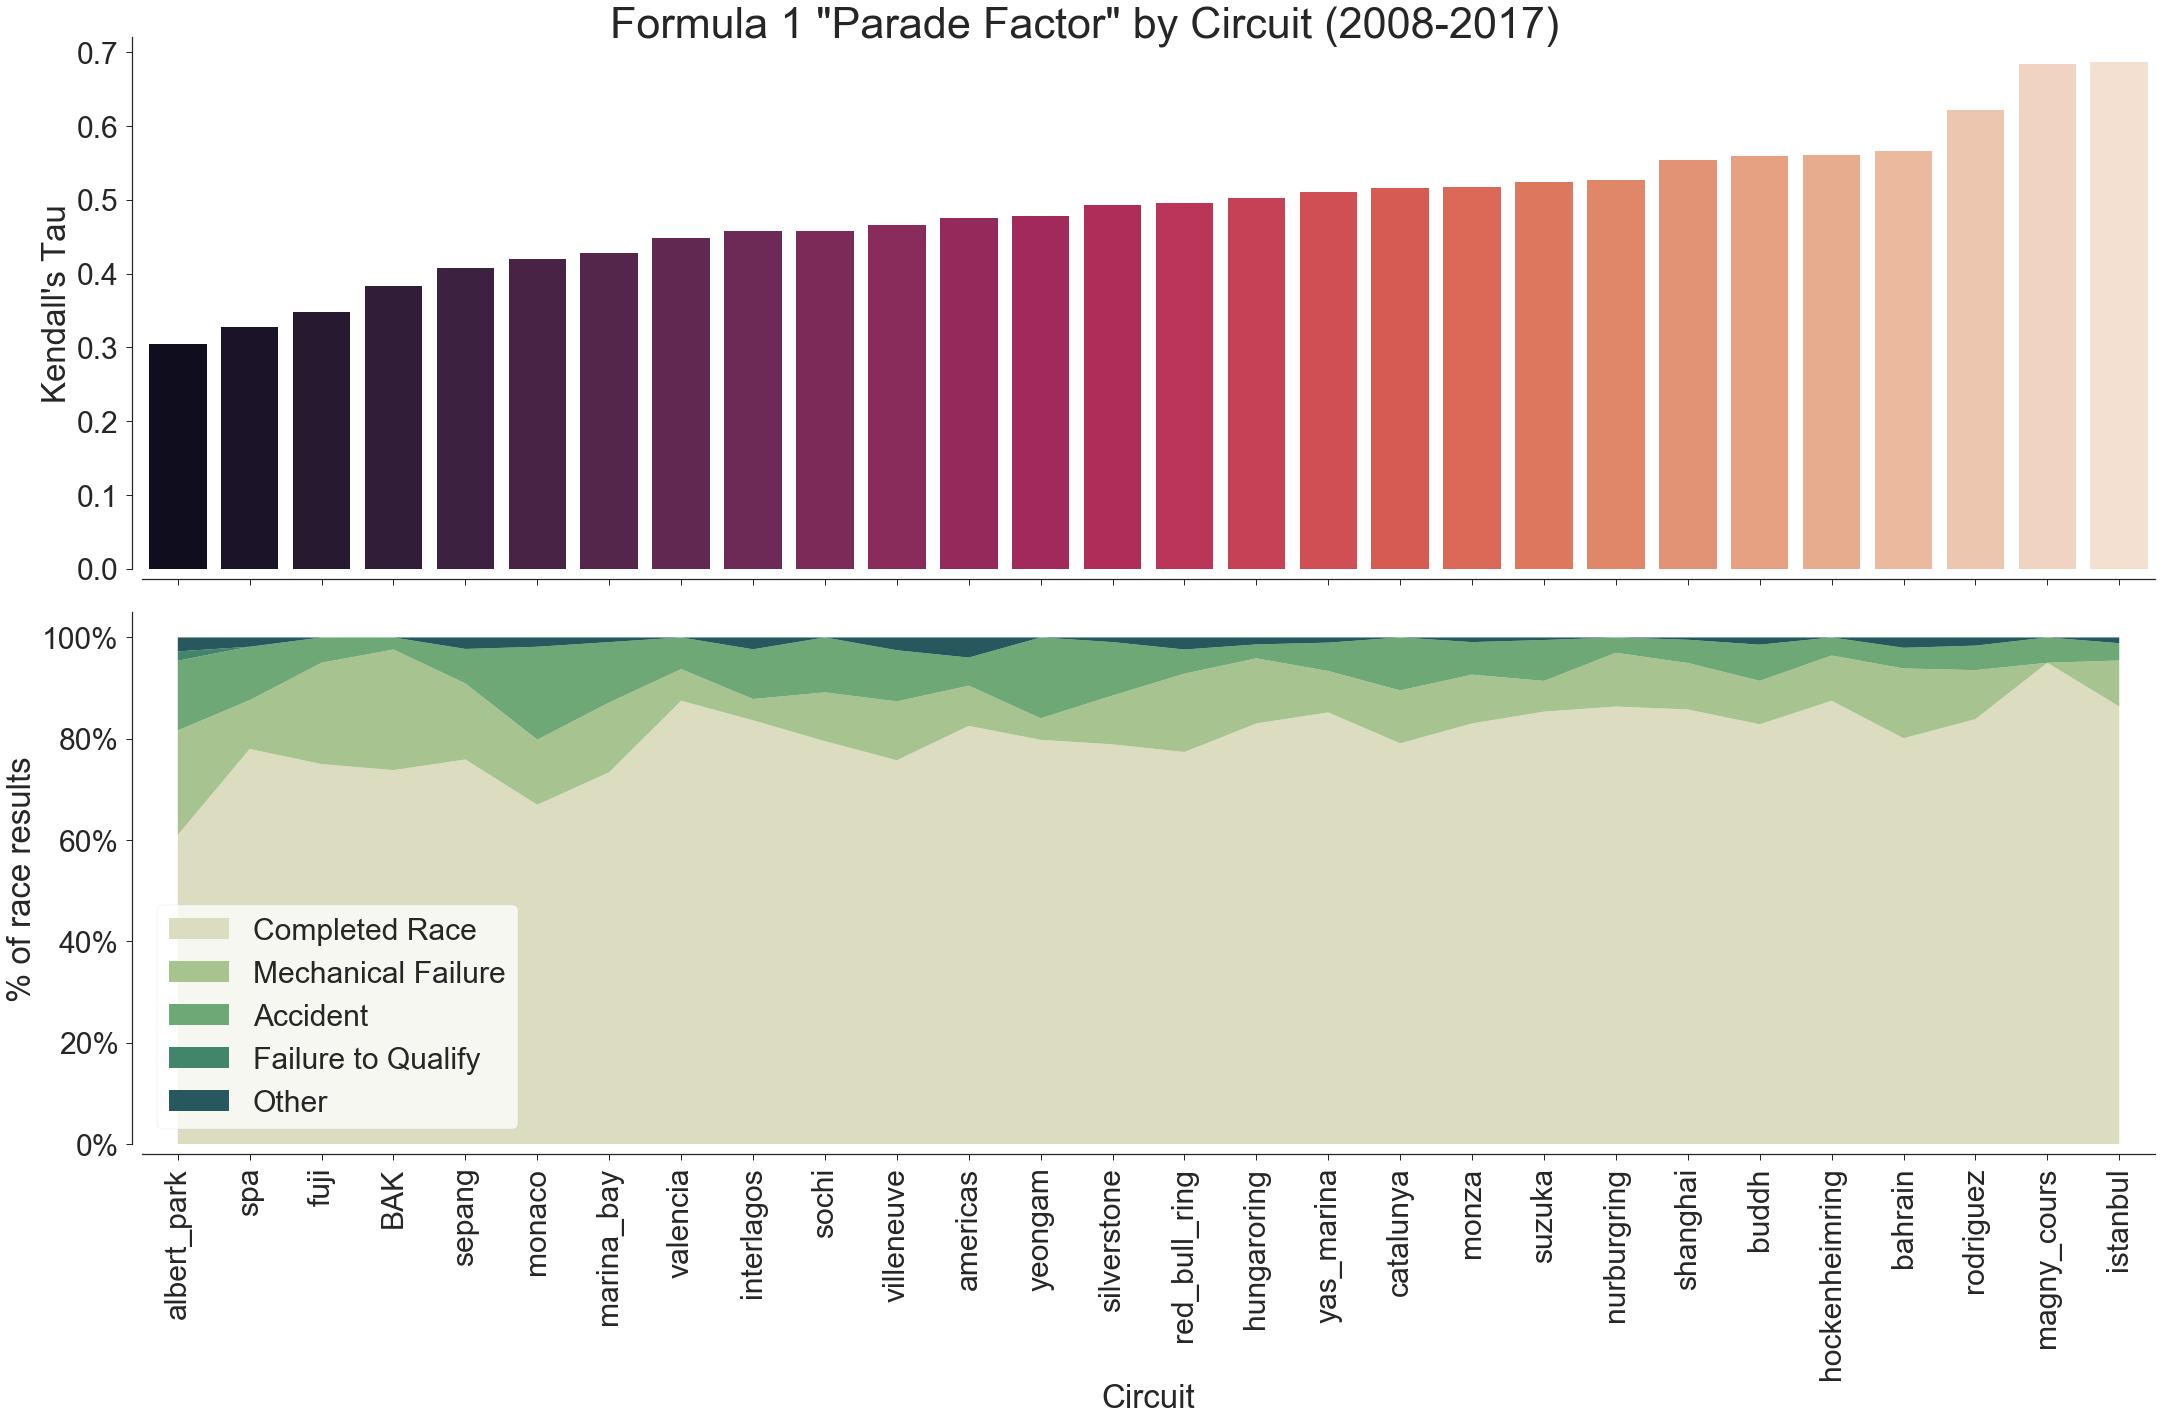 F1 Parade Factor